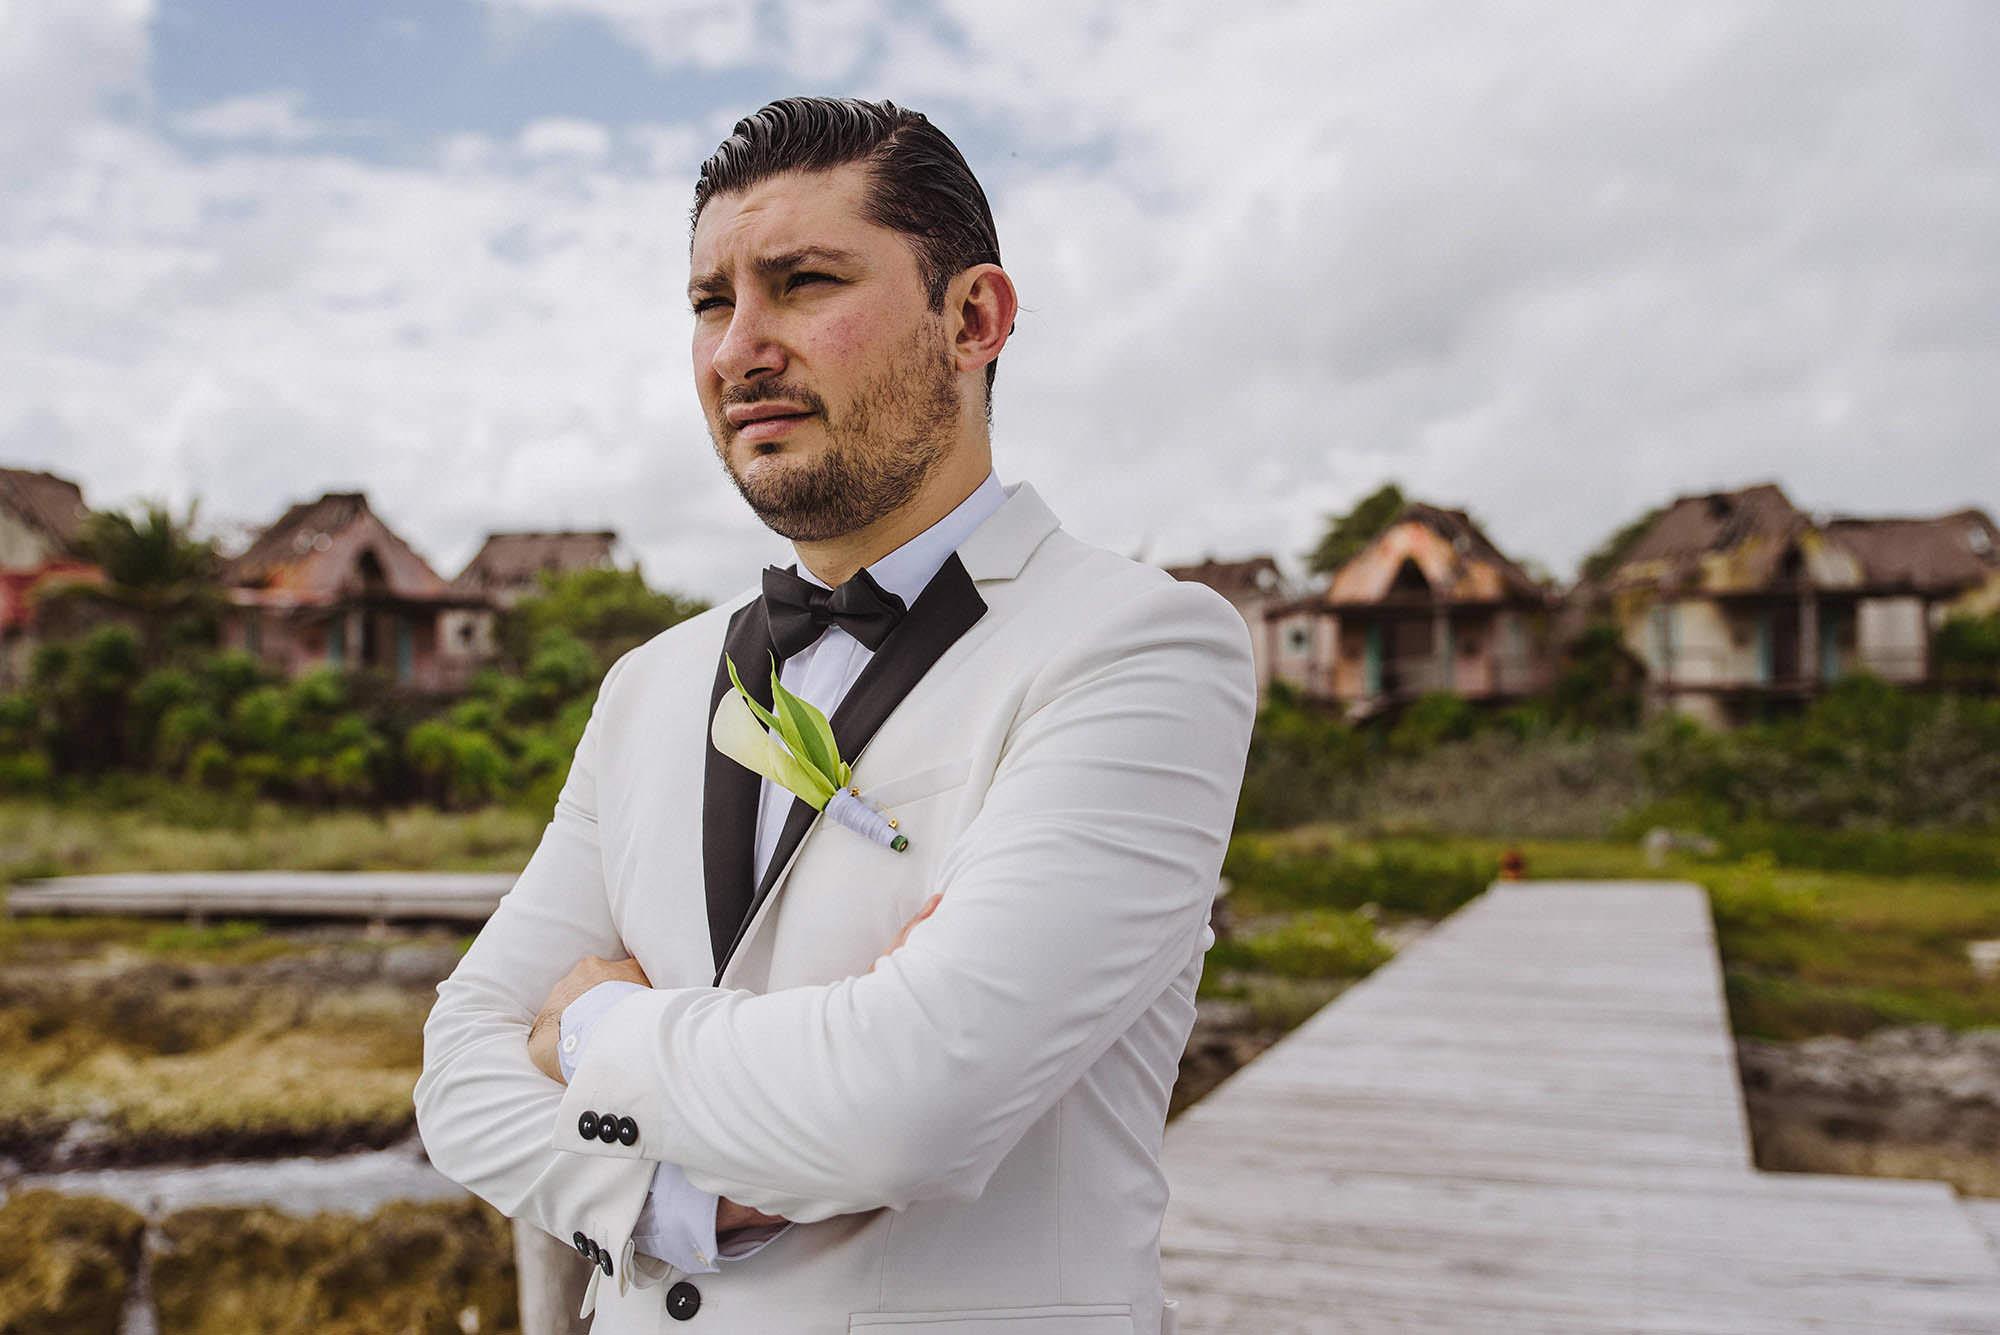 Wedding playa del carmen planner destination mexico magali espinosa13-WEB.jpg